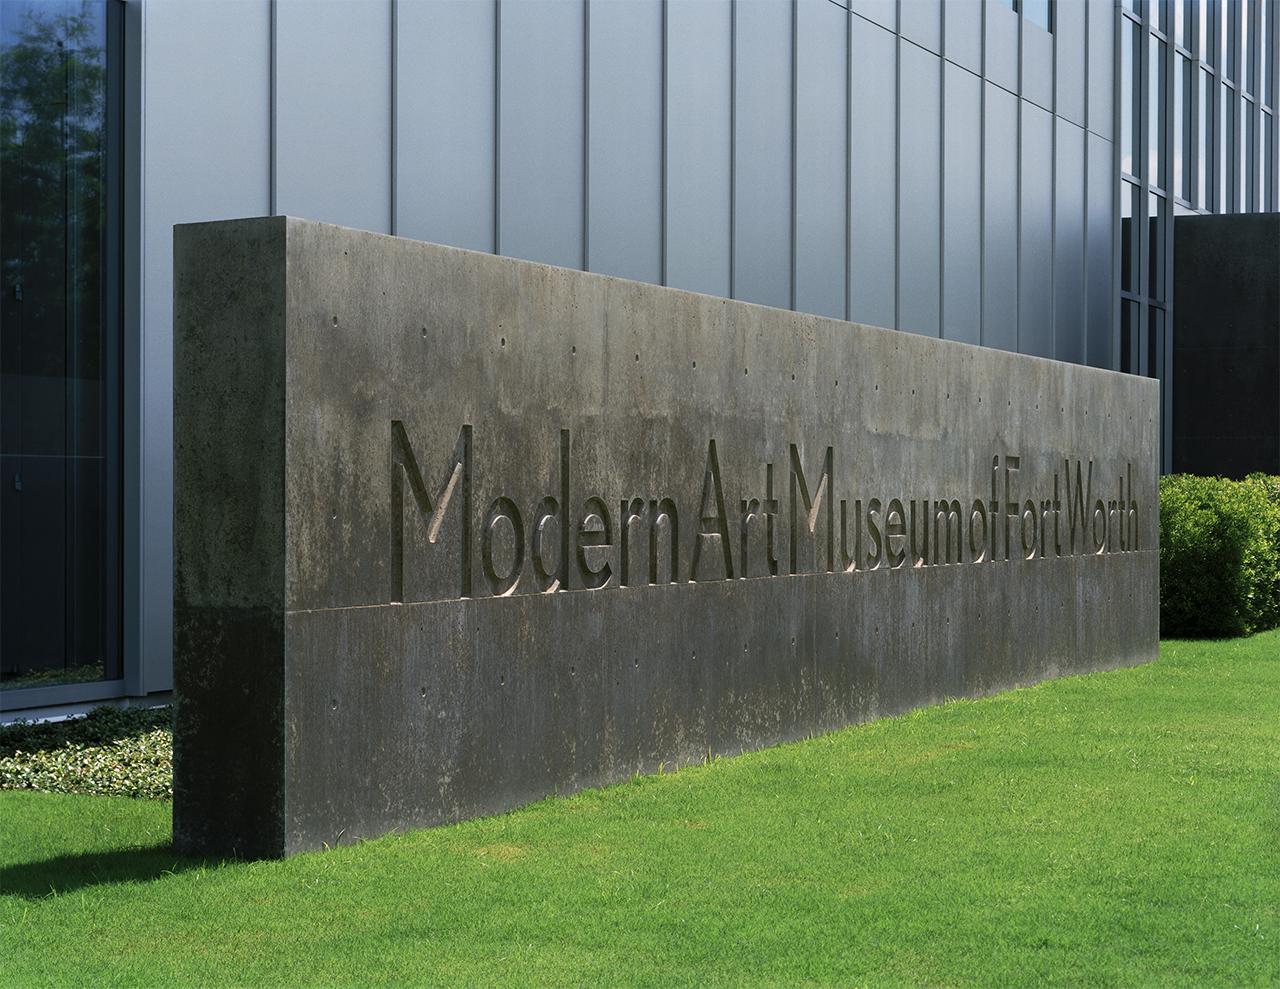 Fort Worth Modern Art Museum Logo